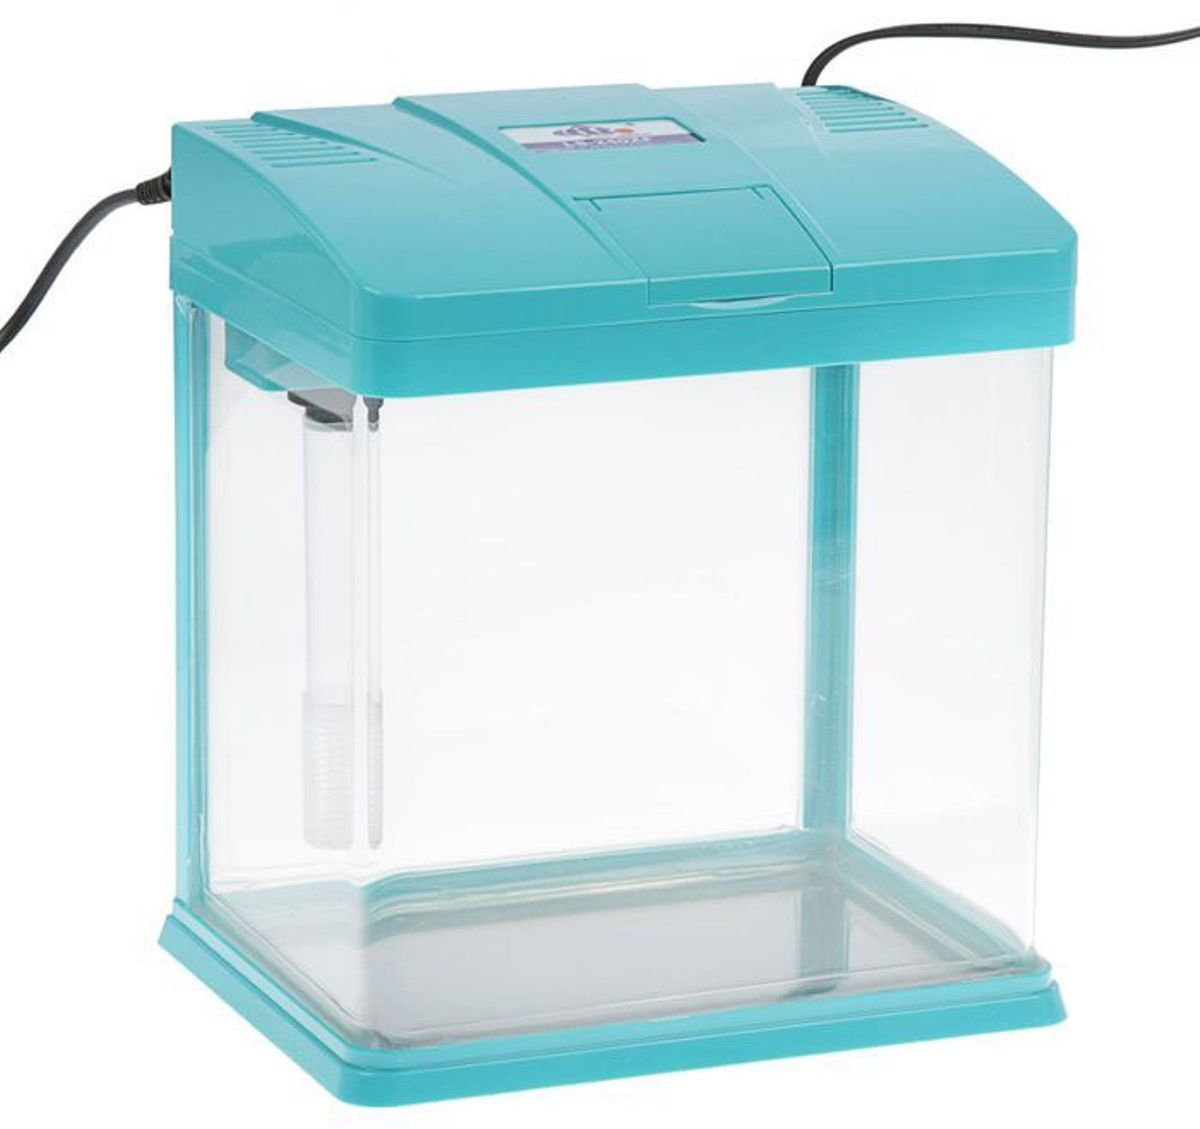 Аквариум Sea Star LS-240, цвет: голубой, прозрачный, 10 л фильтр sea star каскад hx 004 1101293